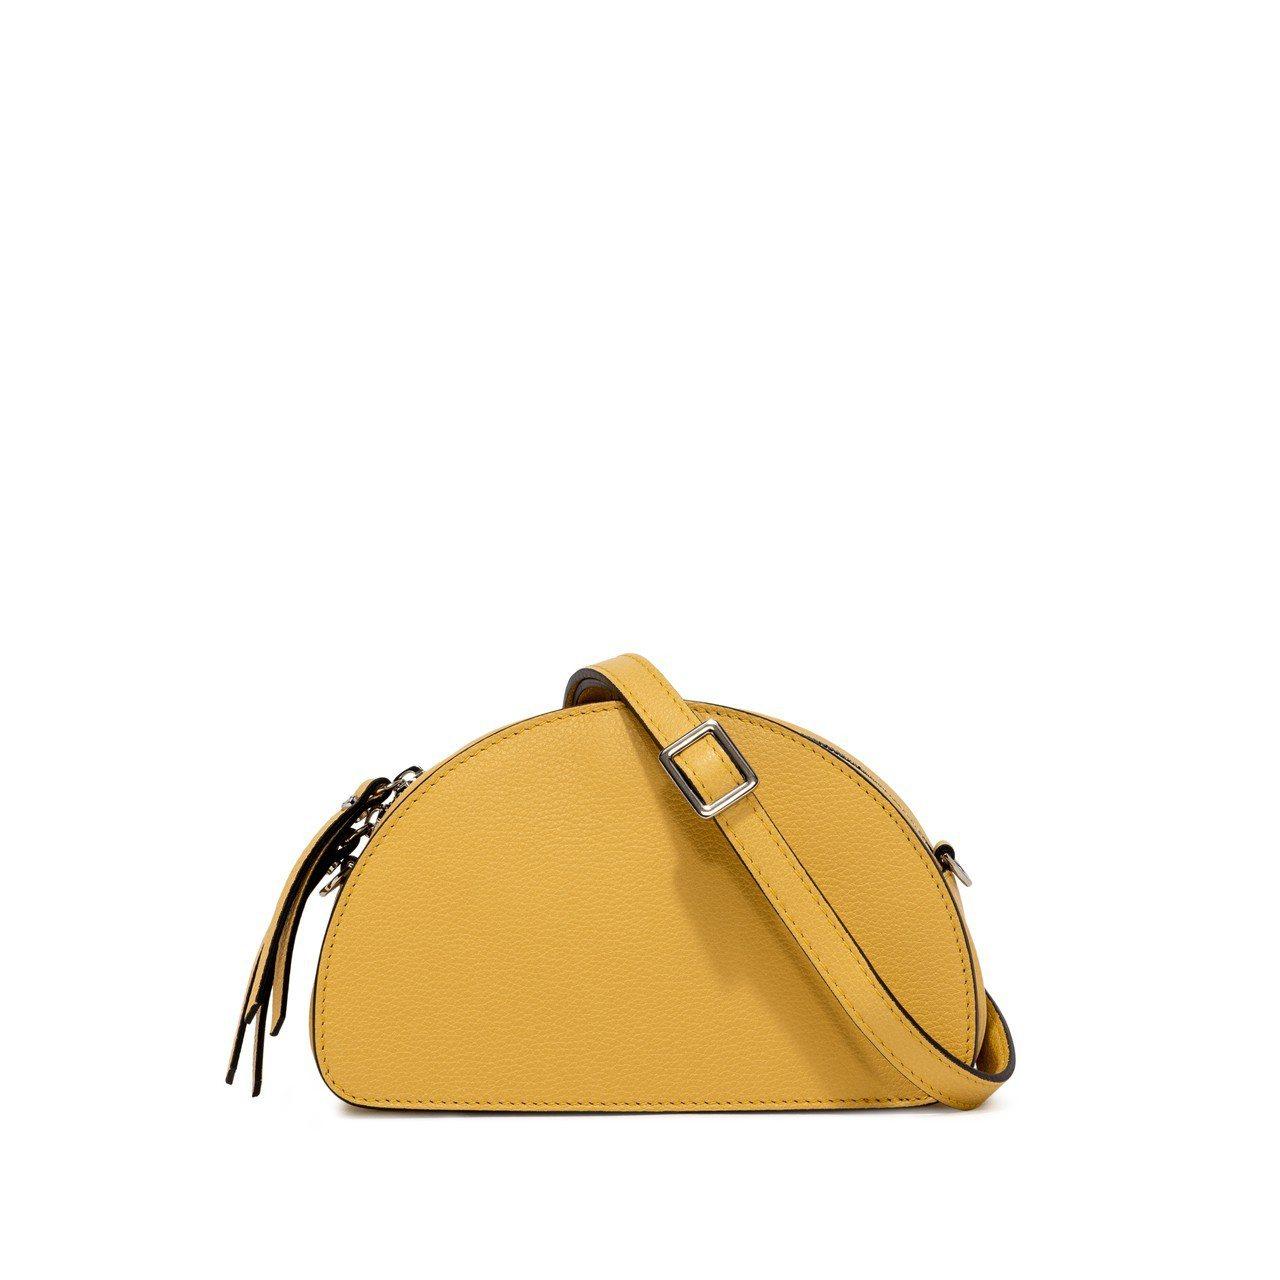 Baby Bug斜背包,售價7,200元。圖/GIANNI CHIARINI提供